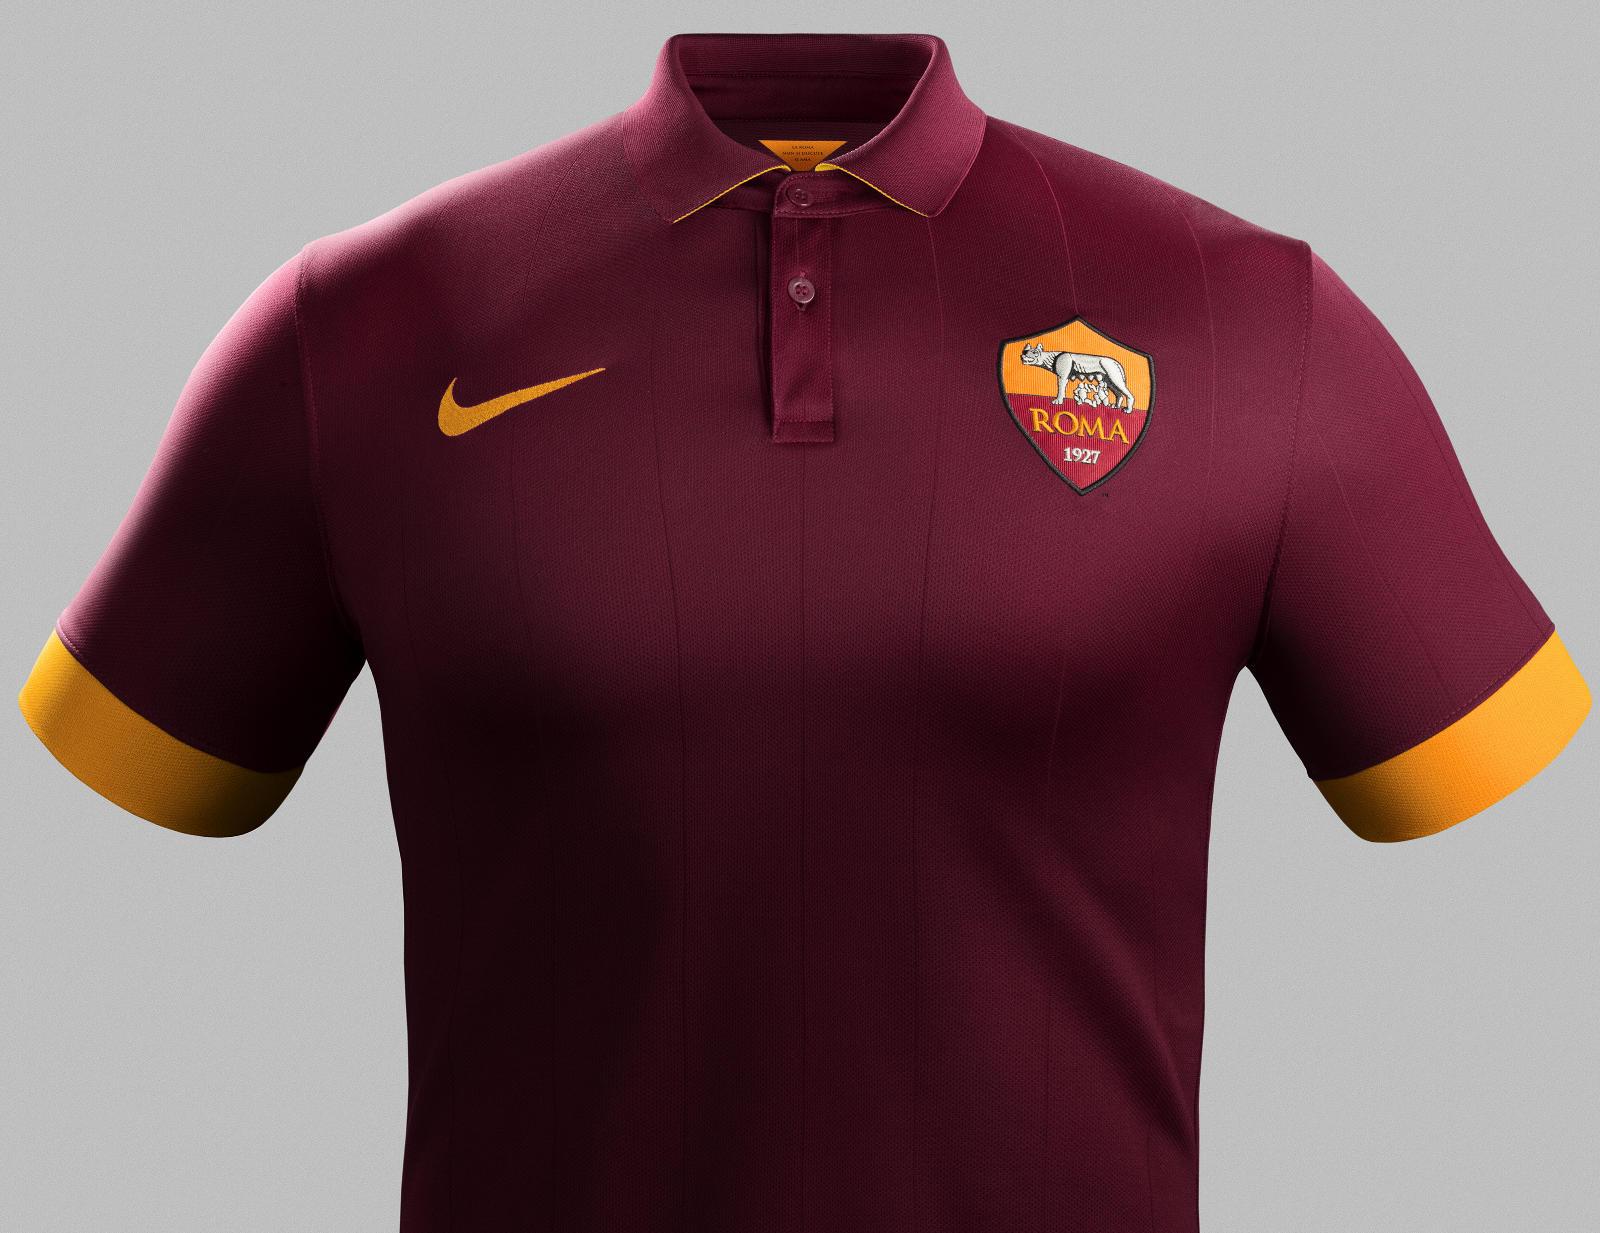 http://1.bp.blogspot.com/-o-GzrSHVQTc/U4Wb_U7BQOI/AAAAAAAAQn0/y6pRRen6cWY/s1600/AS+Roma+14-15+Home+Kit+%283%29.jpg